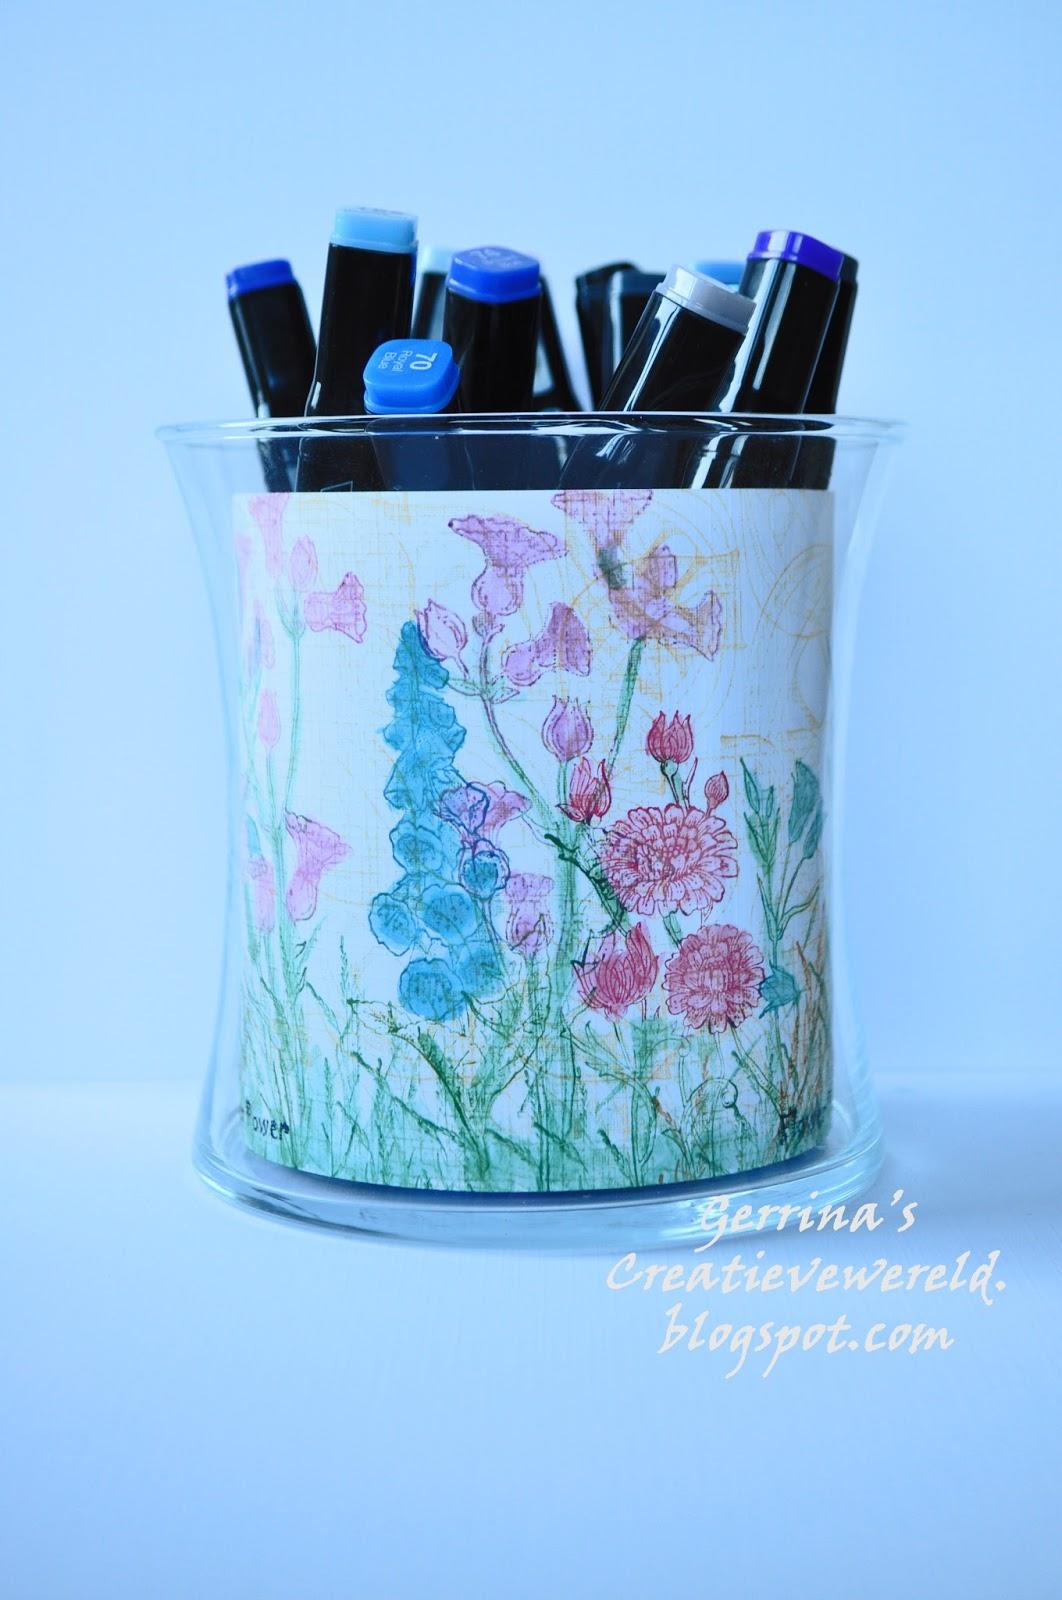 Chocolate Baroque Design Team Floral Pen Holder By Gerrina